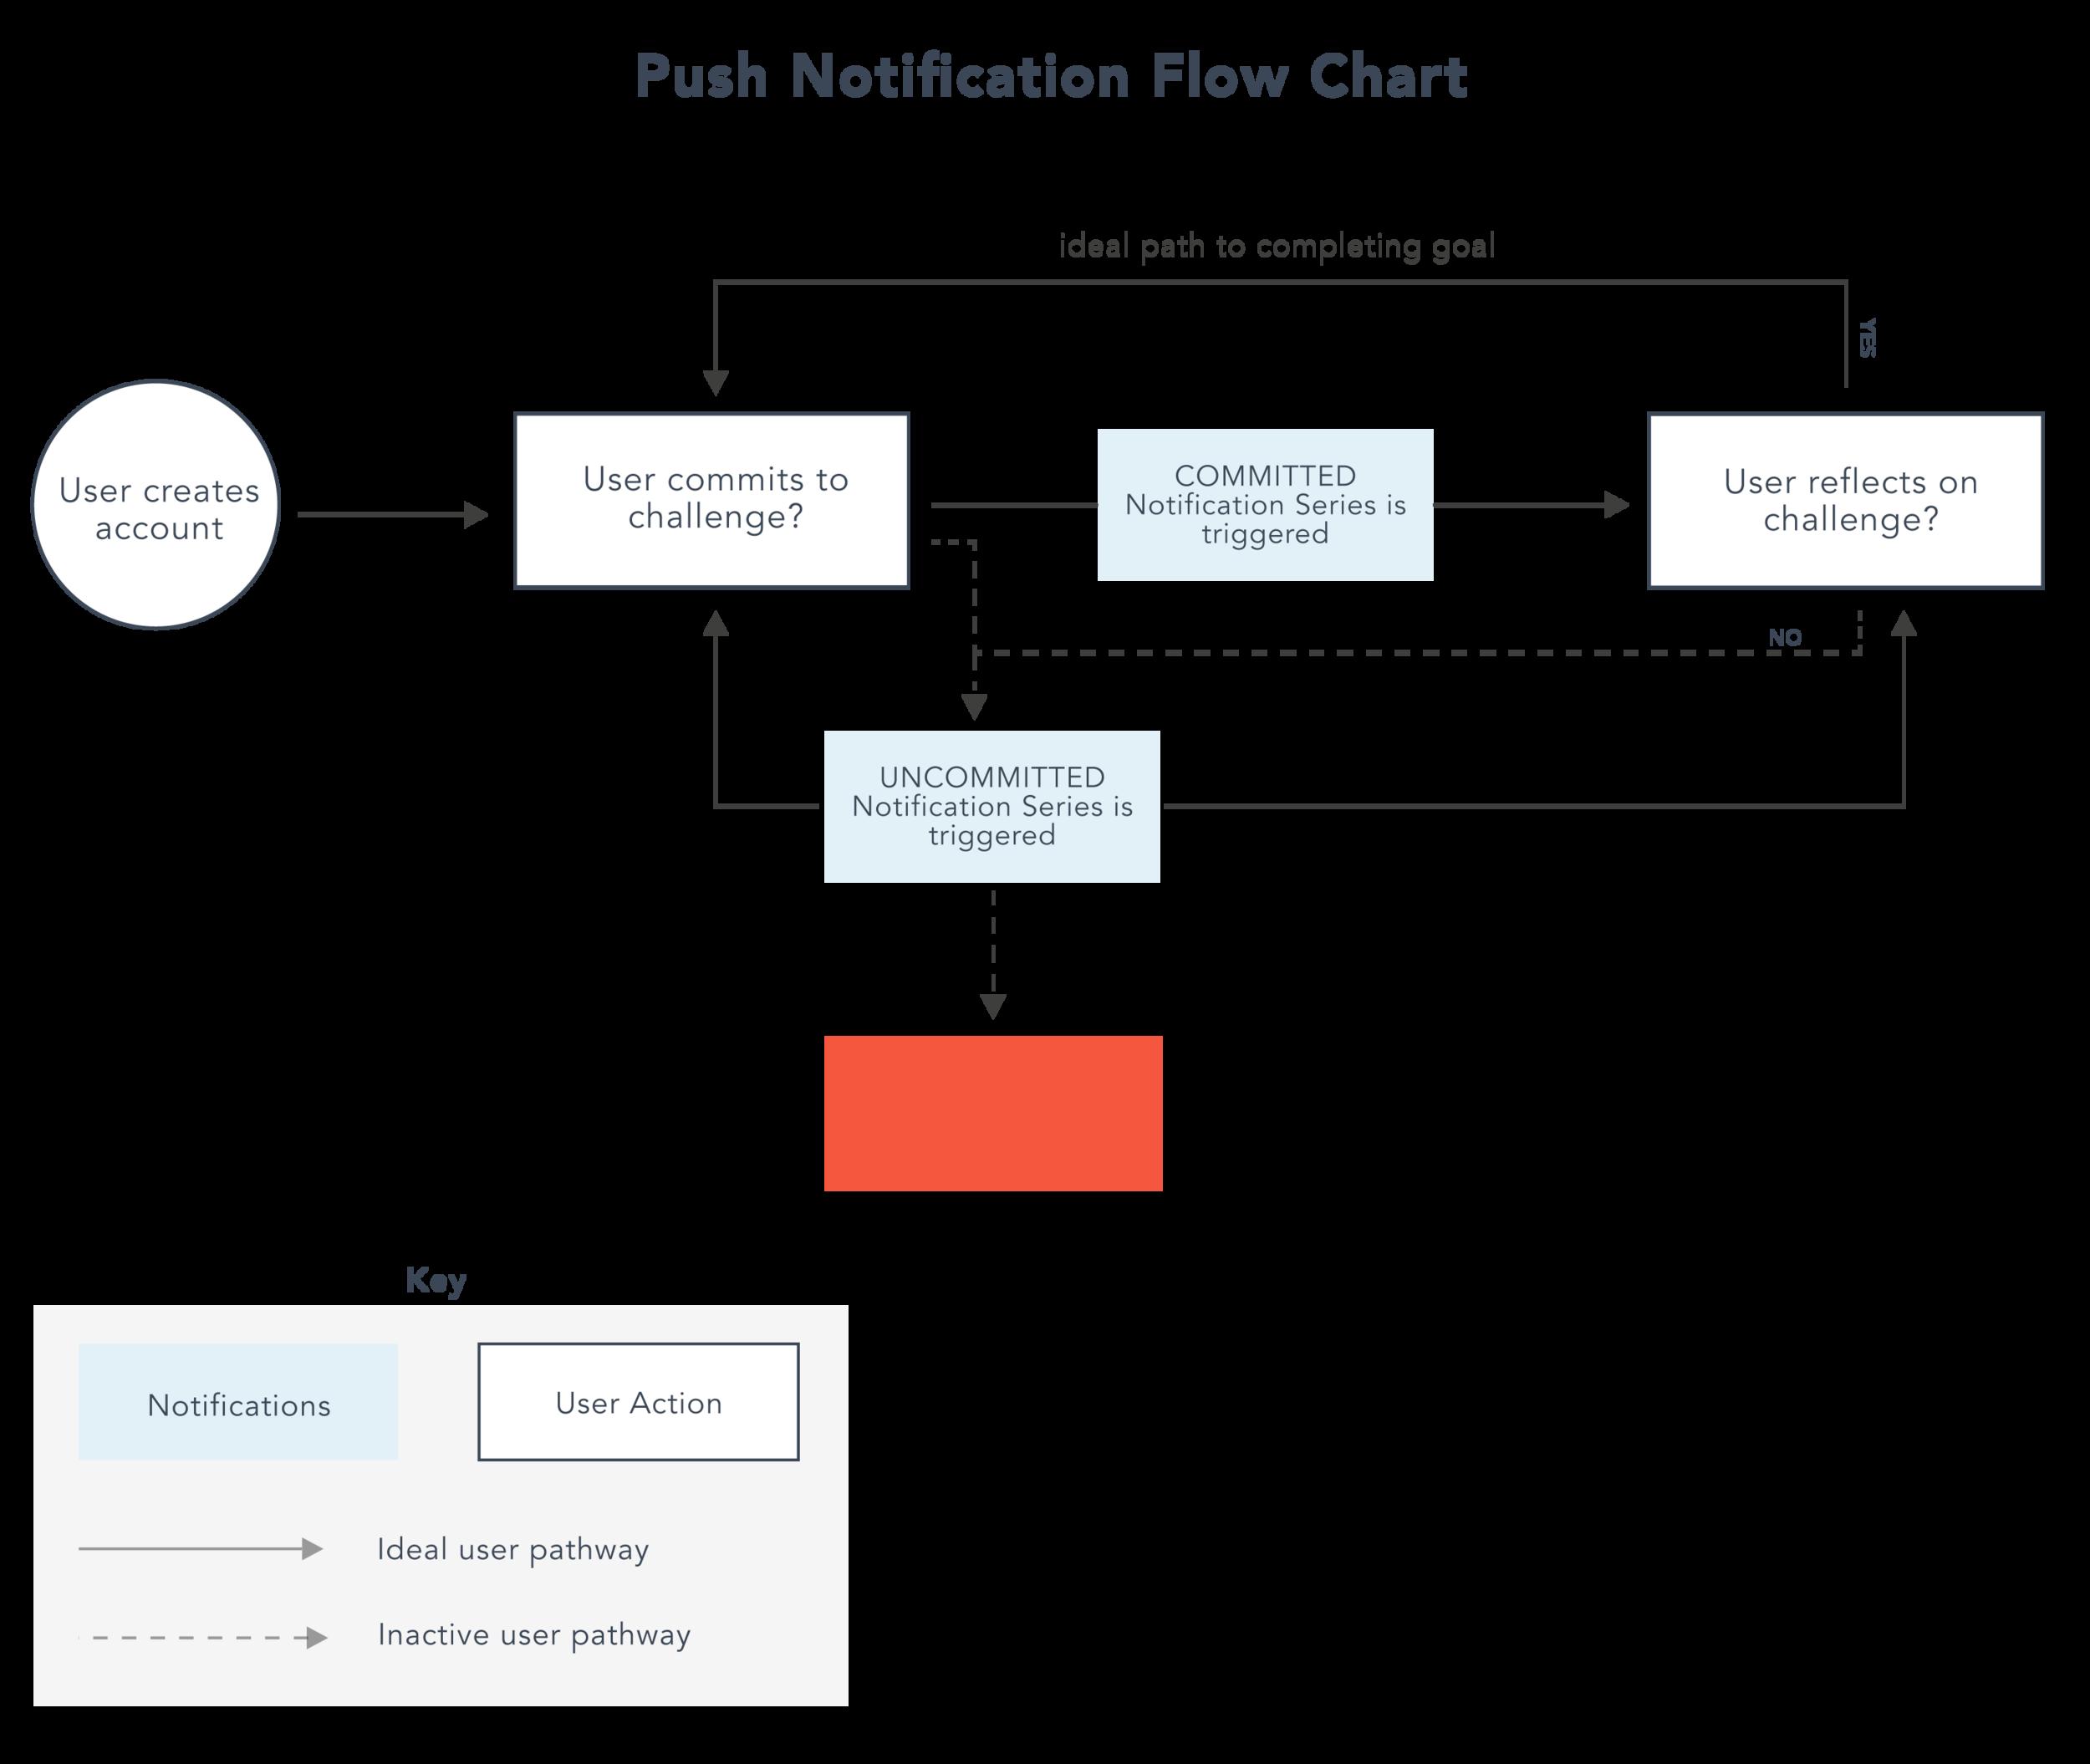 notificationchart-06.png